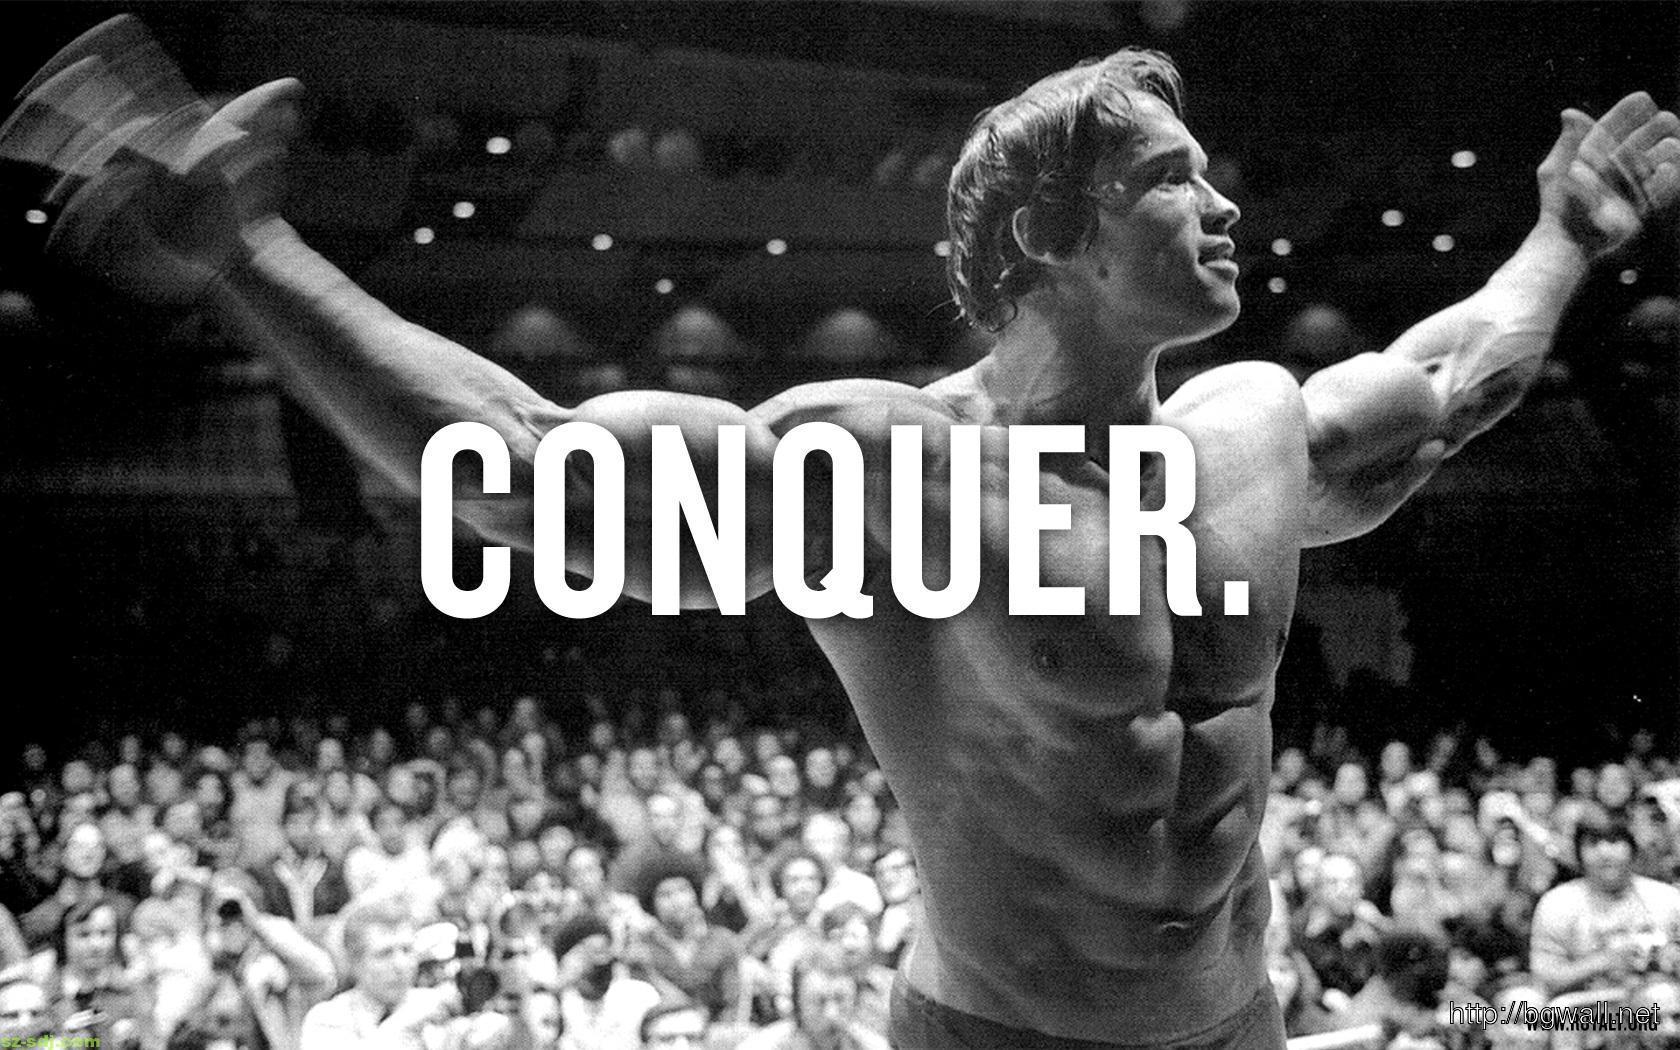 gym-motivation-winner-image-wallpaper